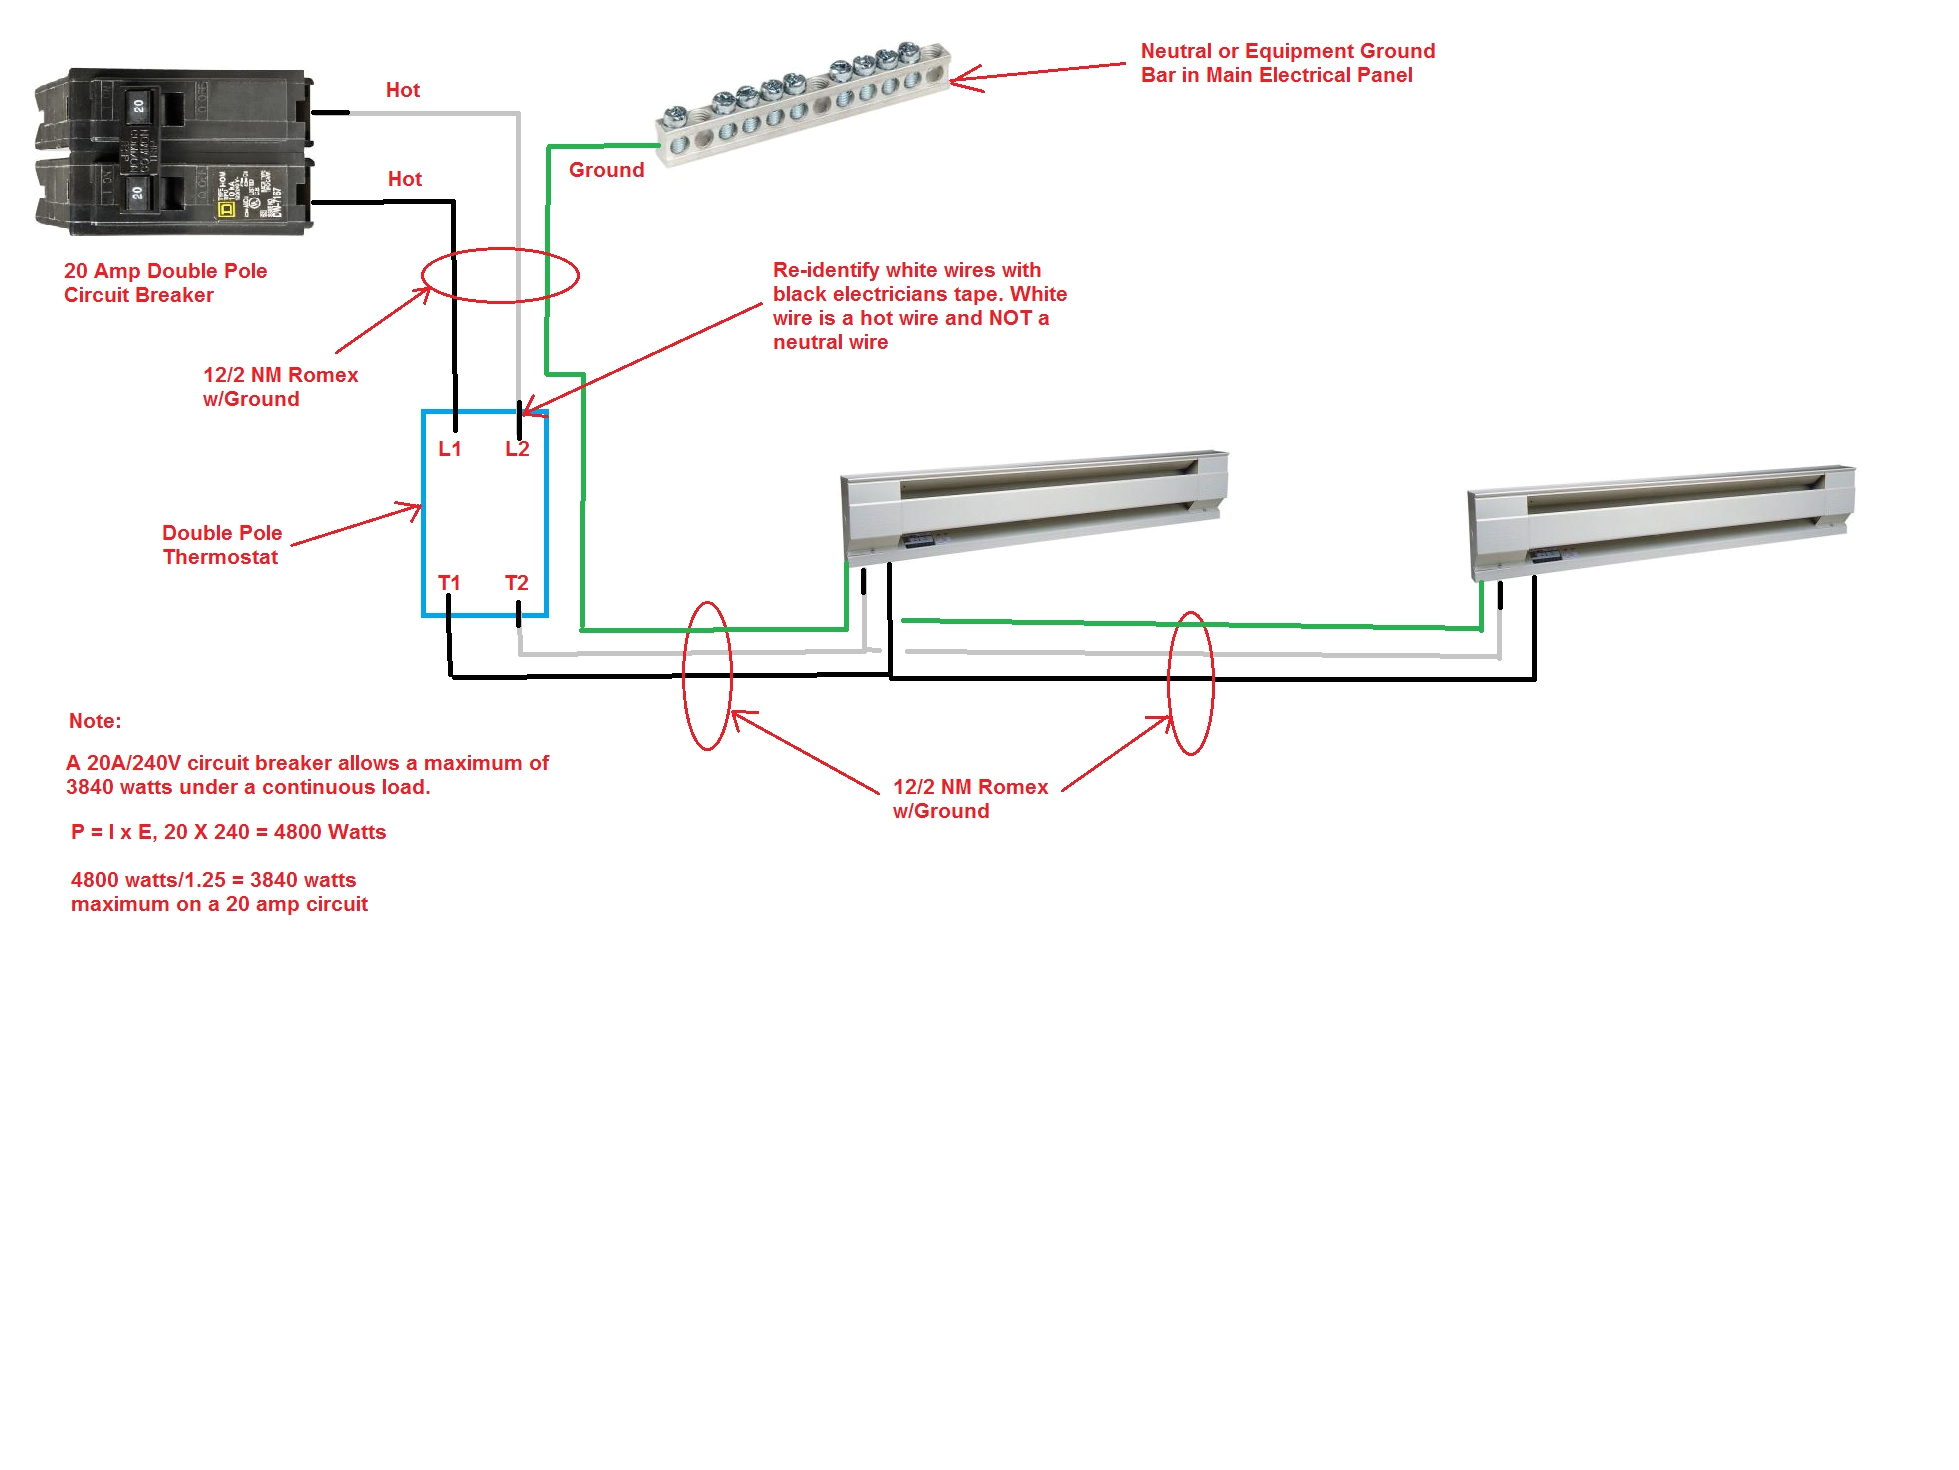 honeywell baseboard thermostat wiring diagram wiring diagram megabaseboard thermostat wiring diagram wiring diagram expert honeywell baseboard